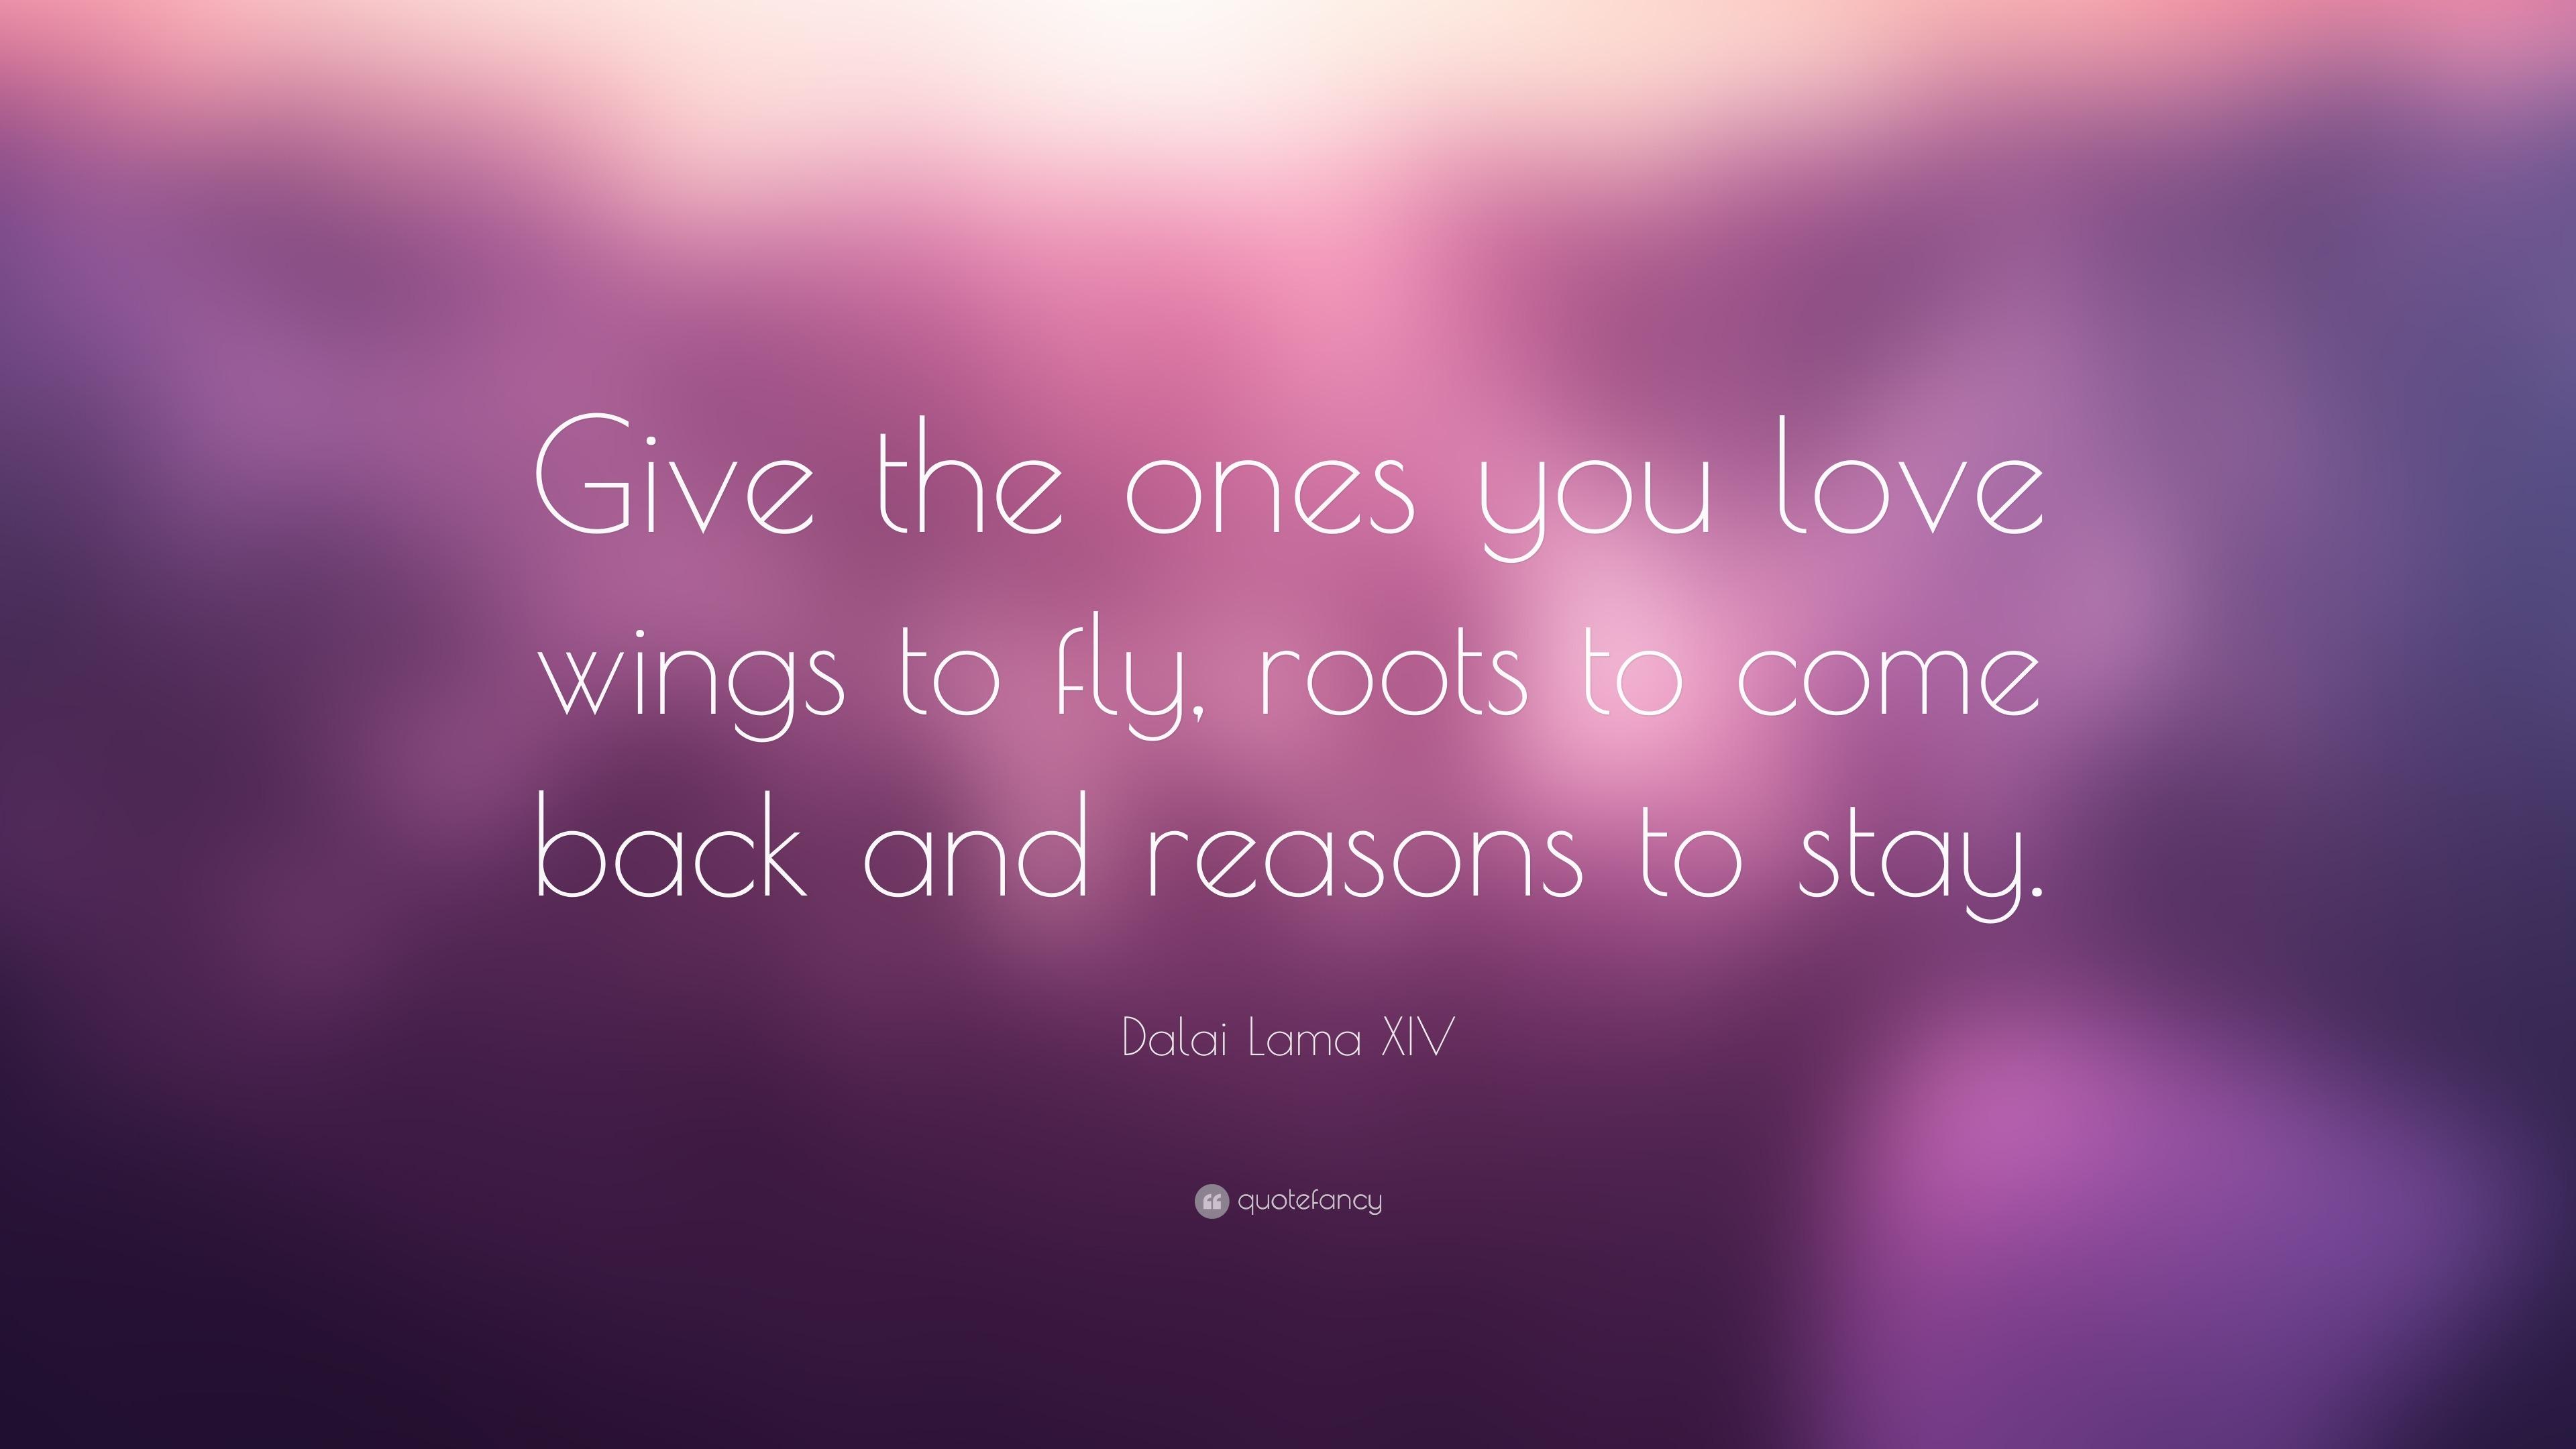 dalai lama quotes love - photo #28